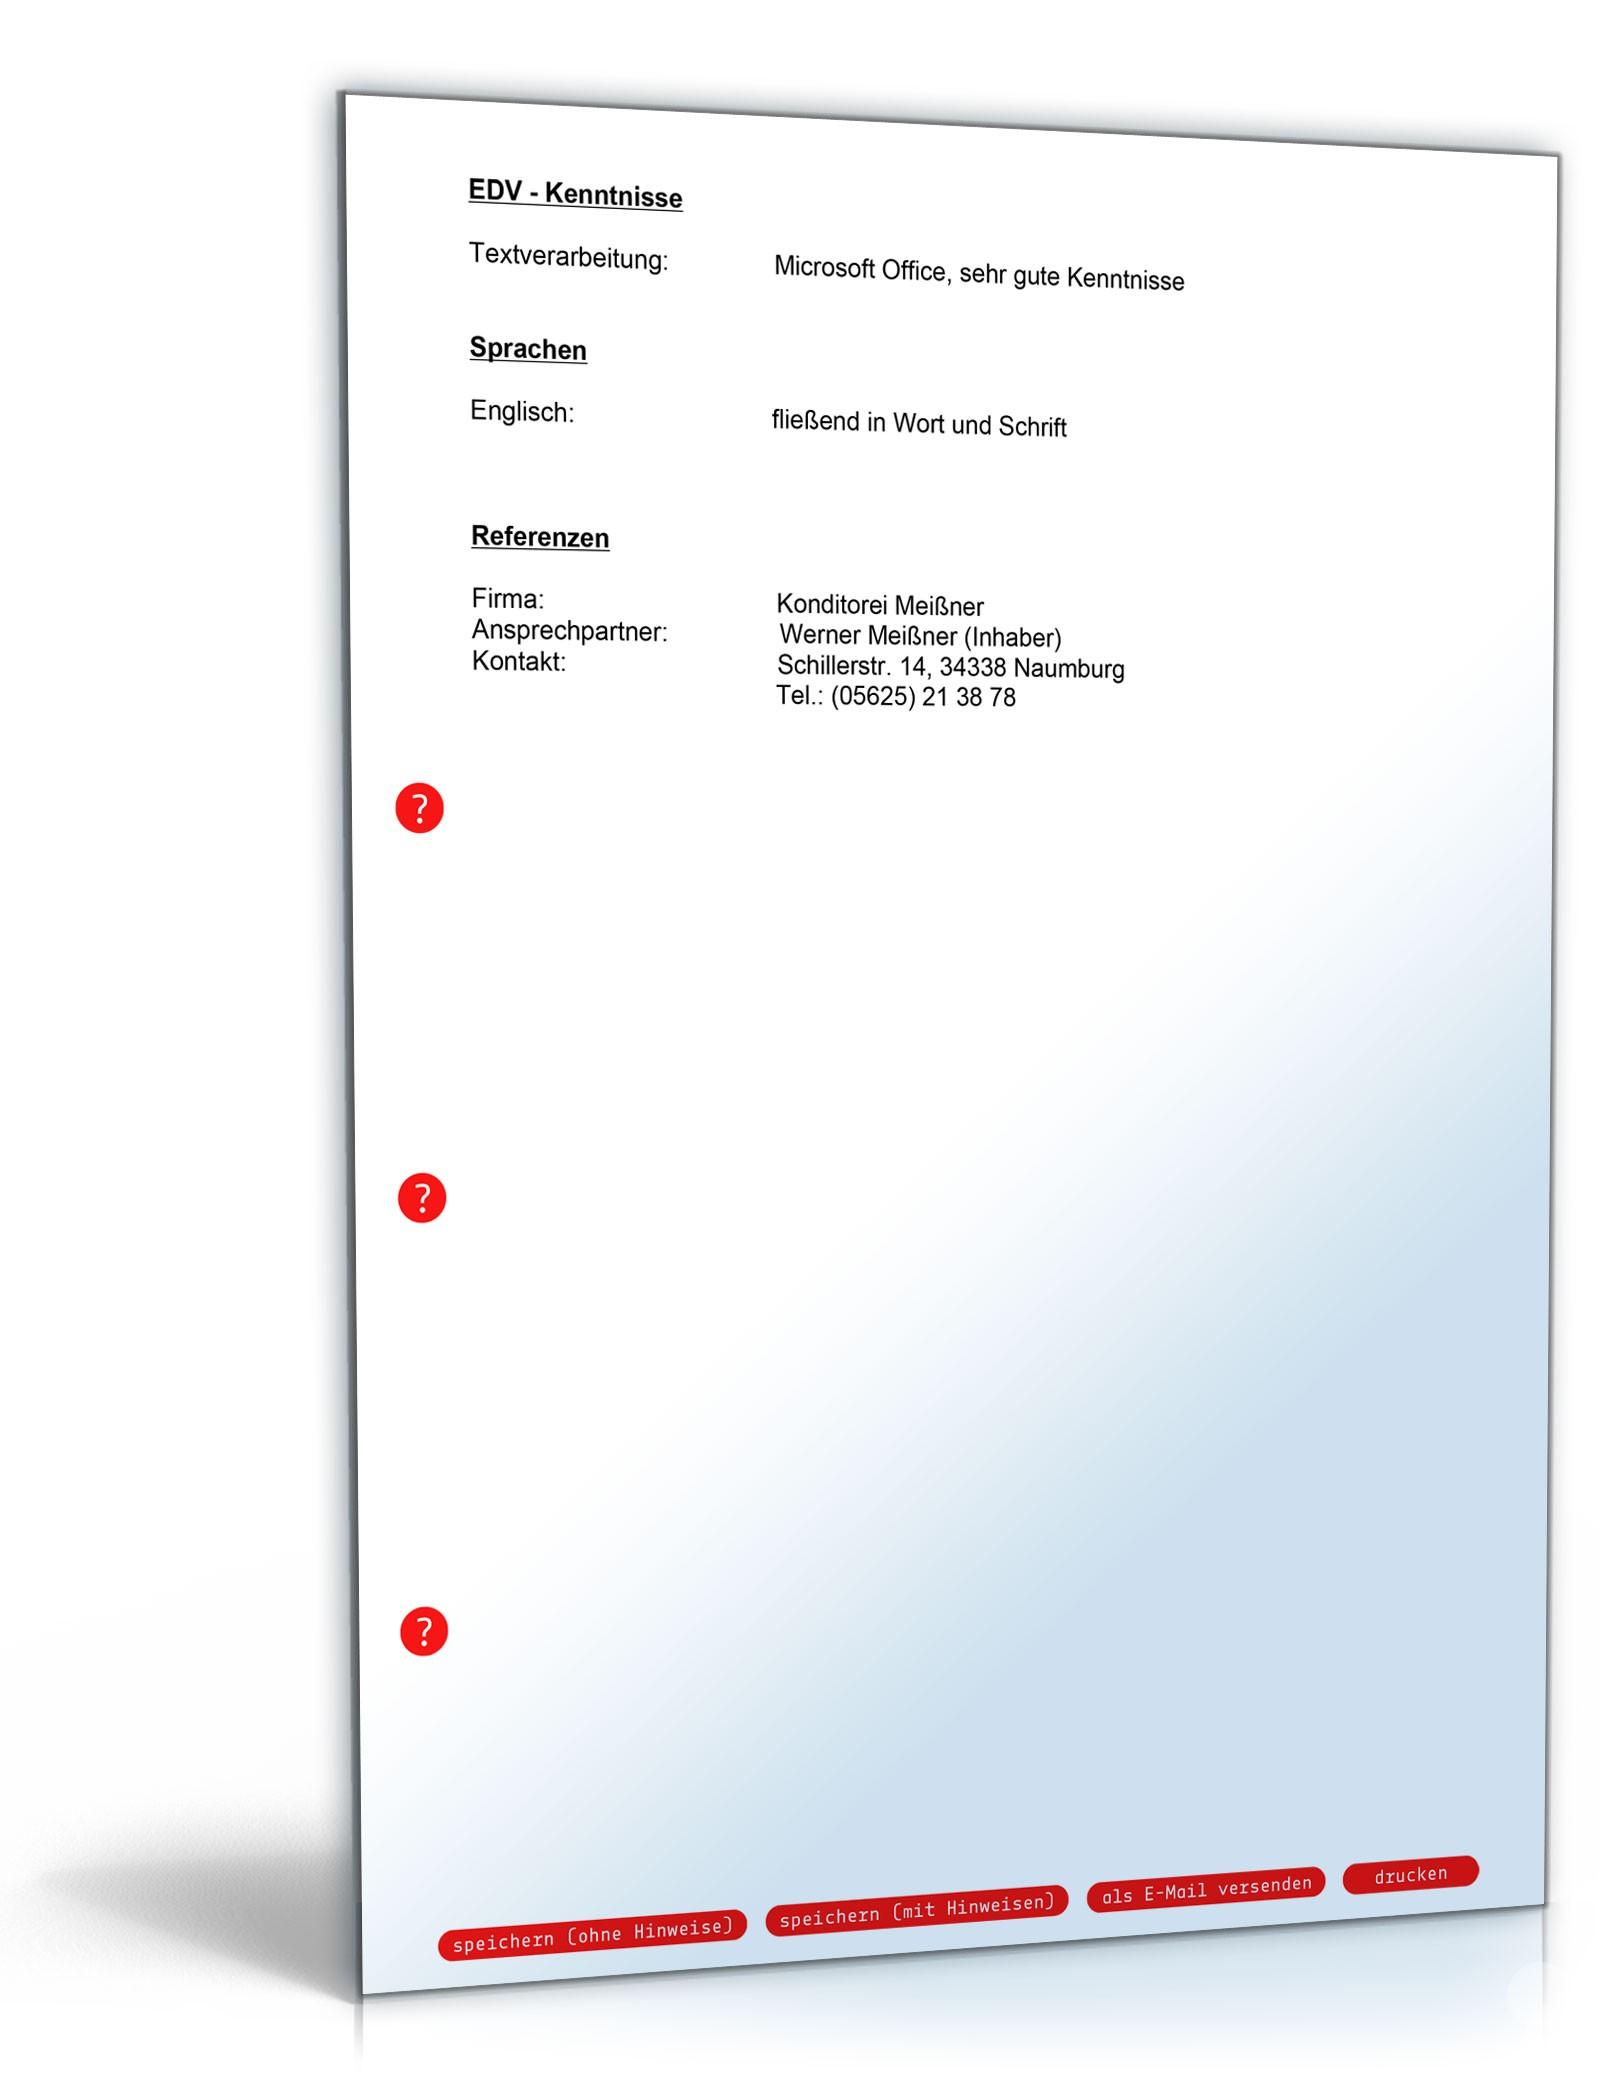 Lebenslauf Kellner | Muster zum Download